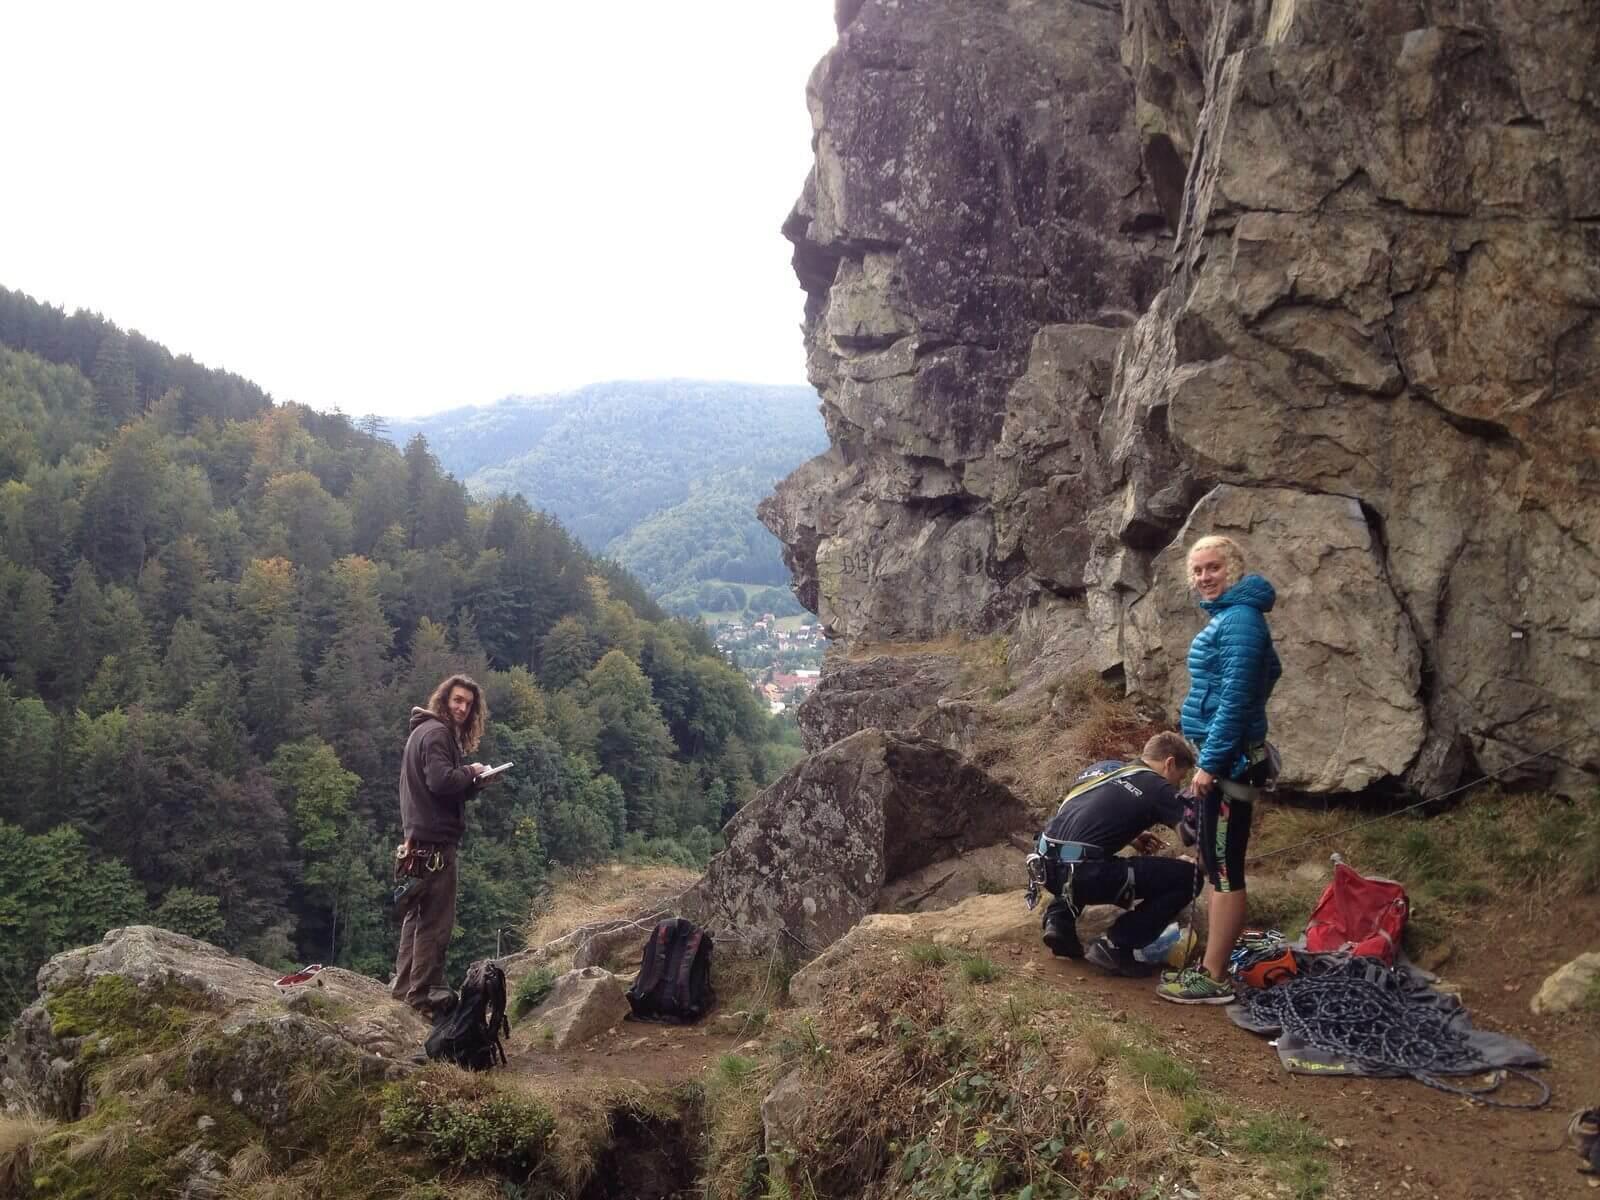 Klettersteig Todtnau : Geocaching log by die tummetotts for todtnauer klettersteig